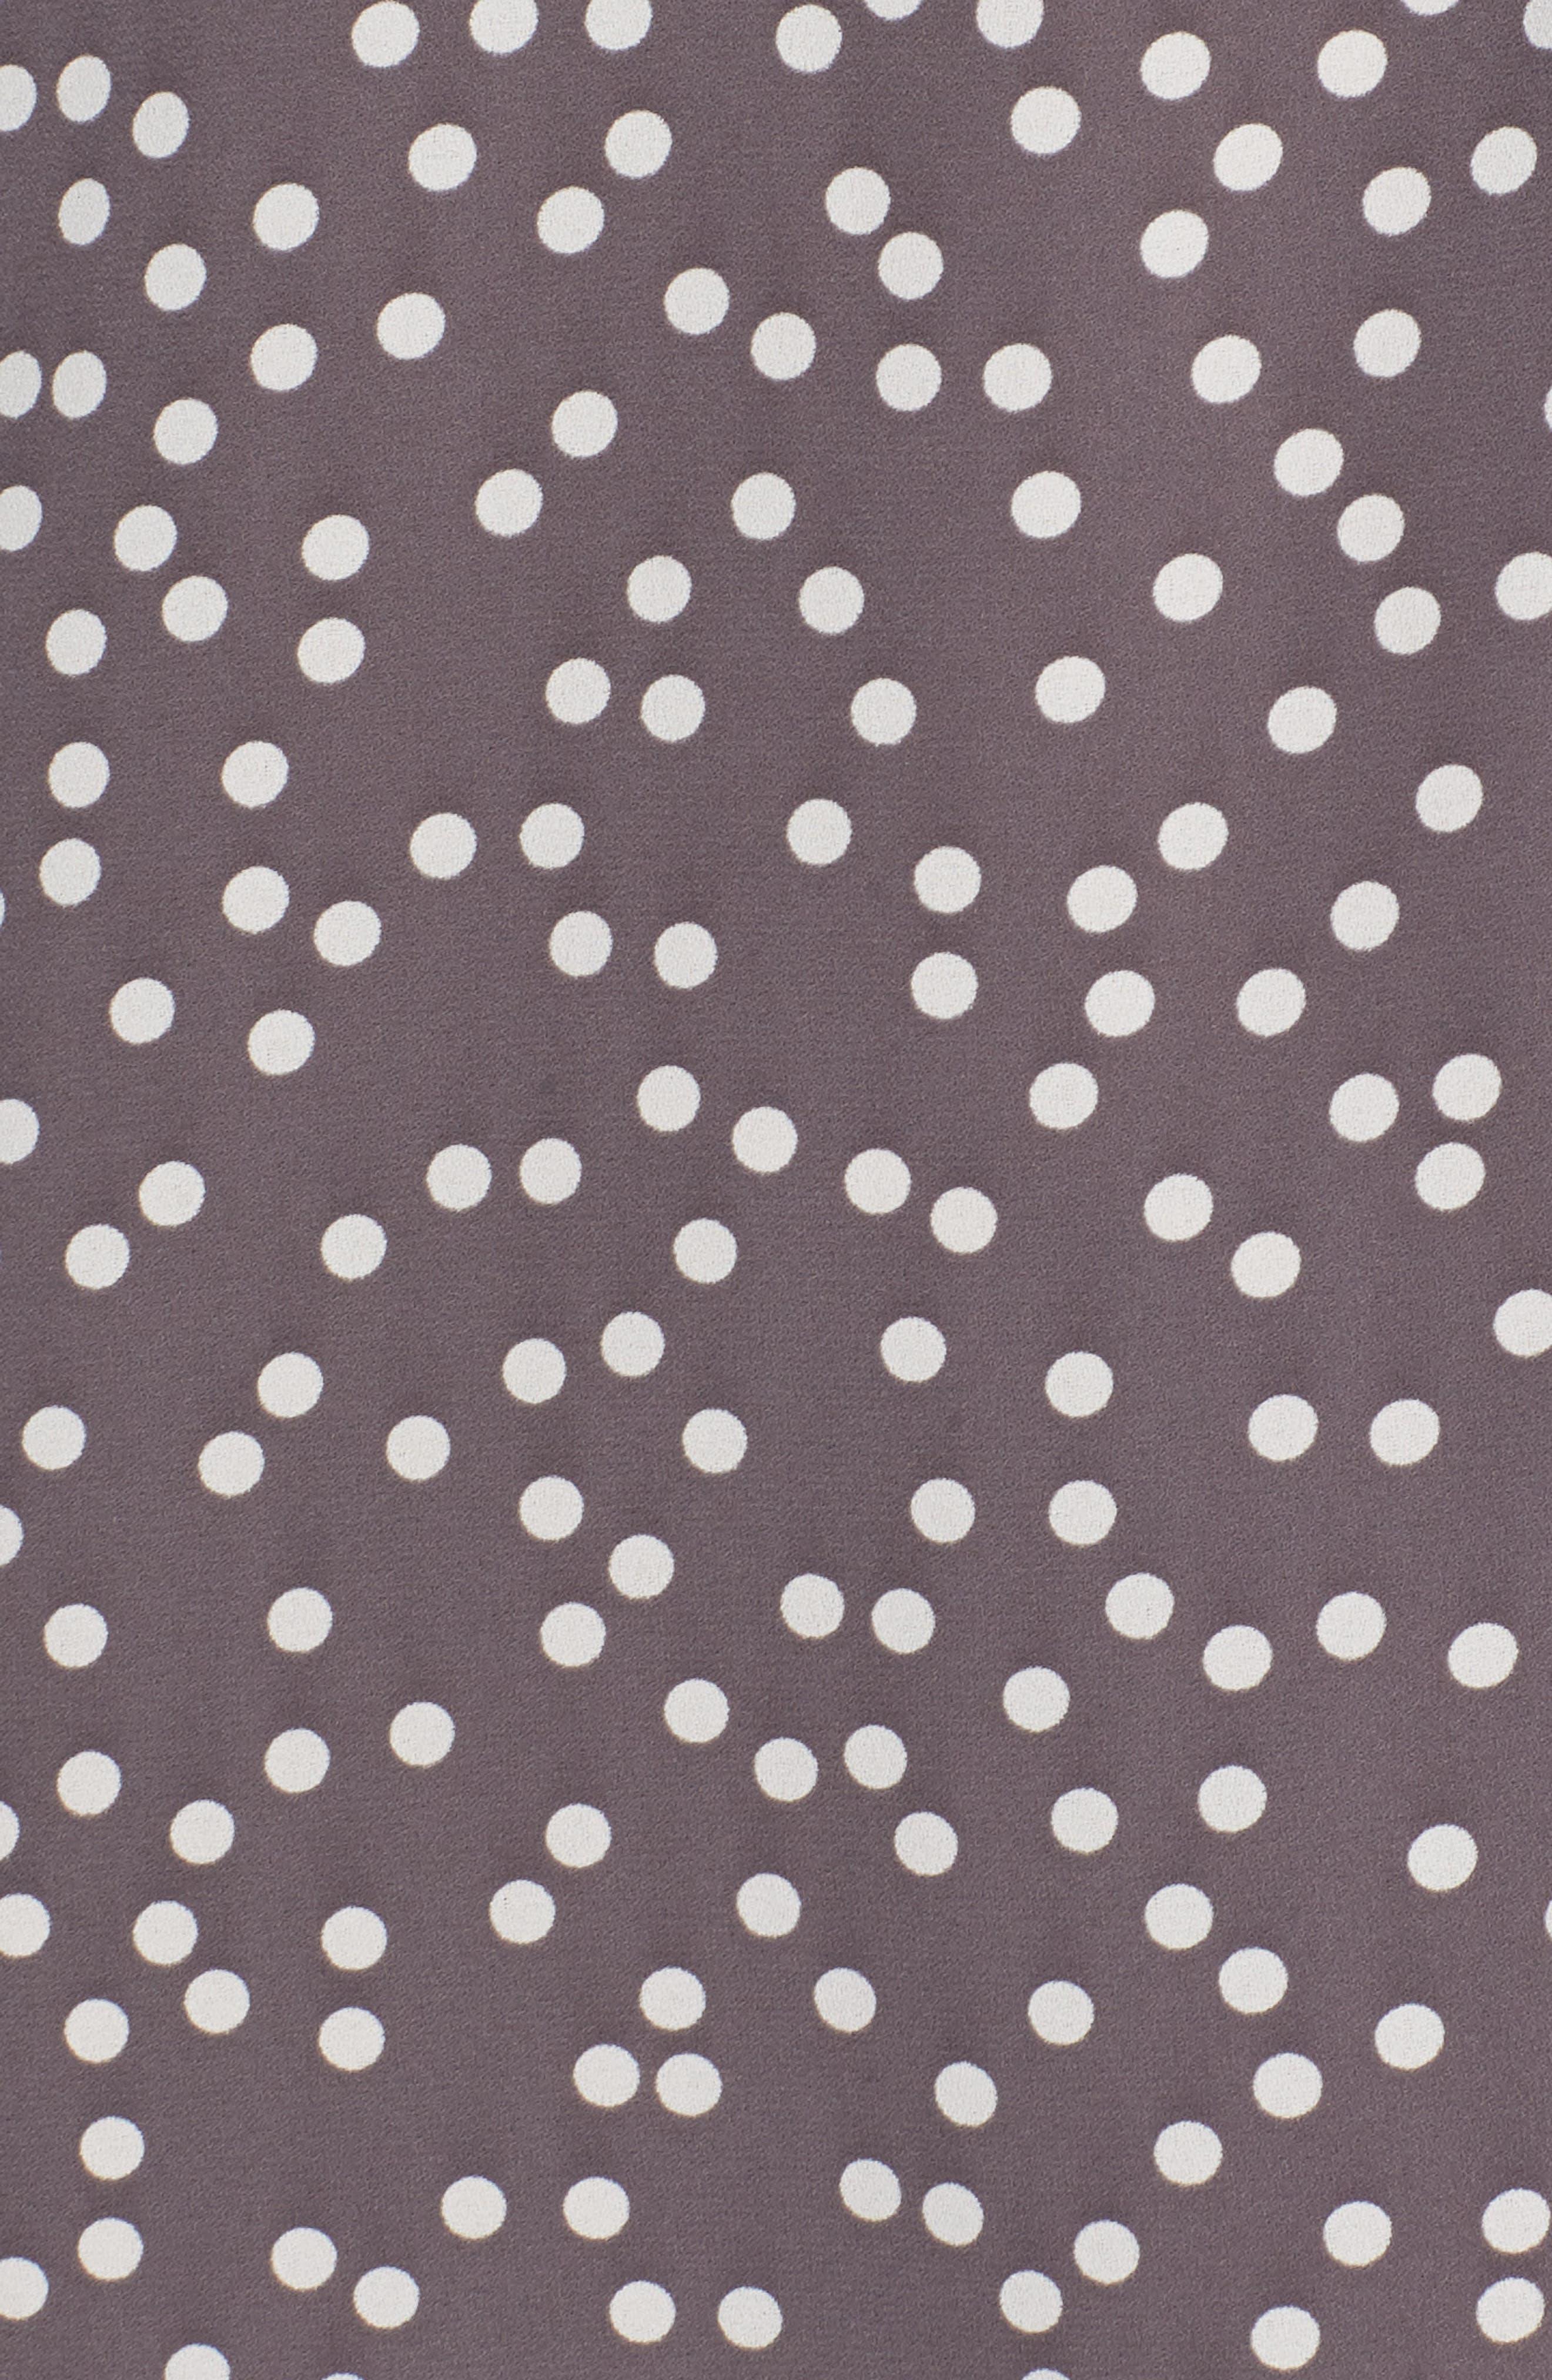 Dot Print Long Sleeve Blouse,                             Alternate thumbnail 6, color,                             Nantucket Grey/ Oyster Shell